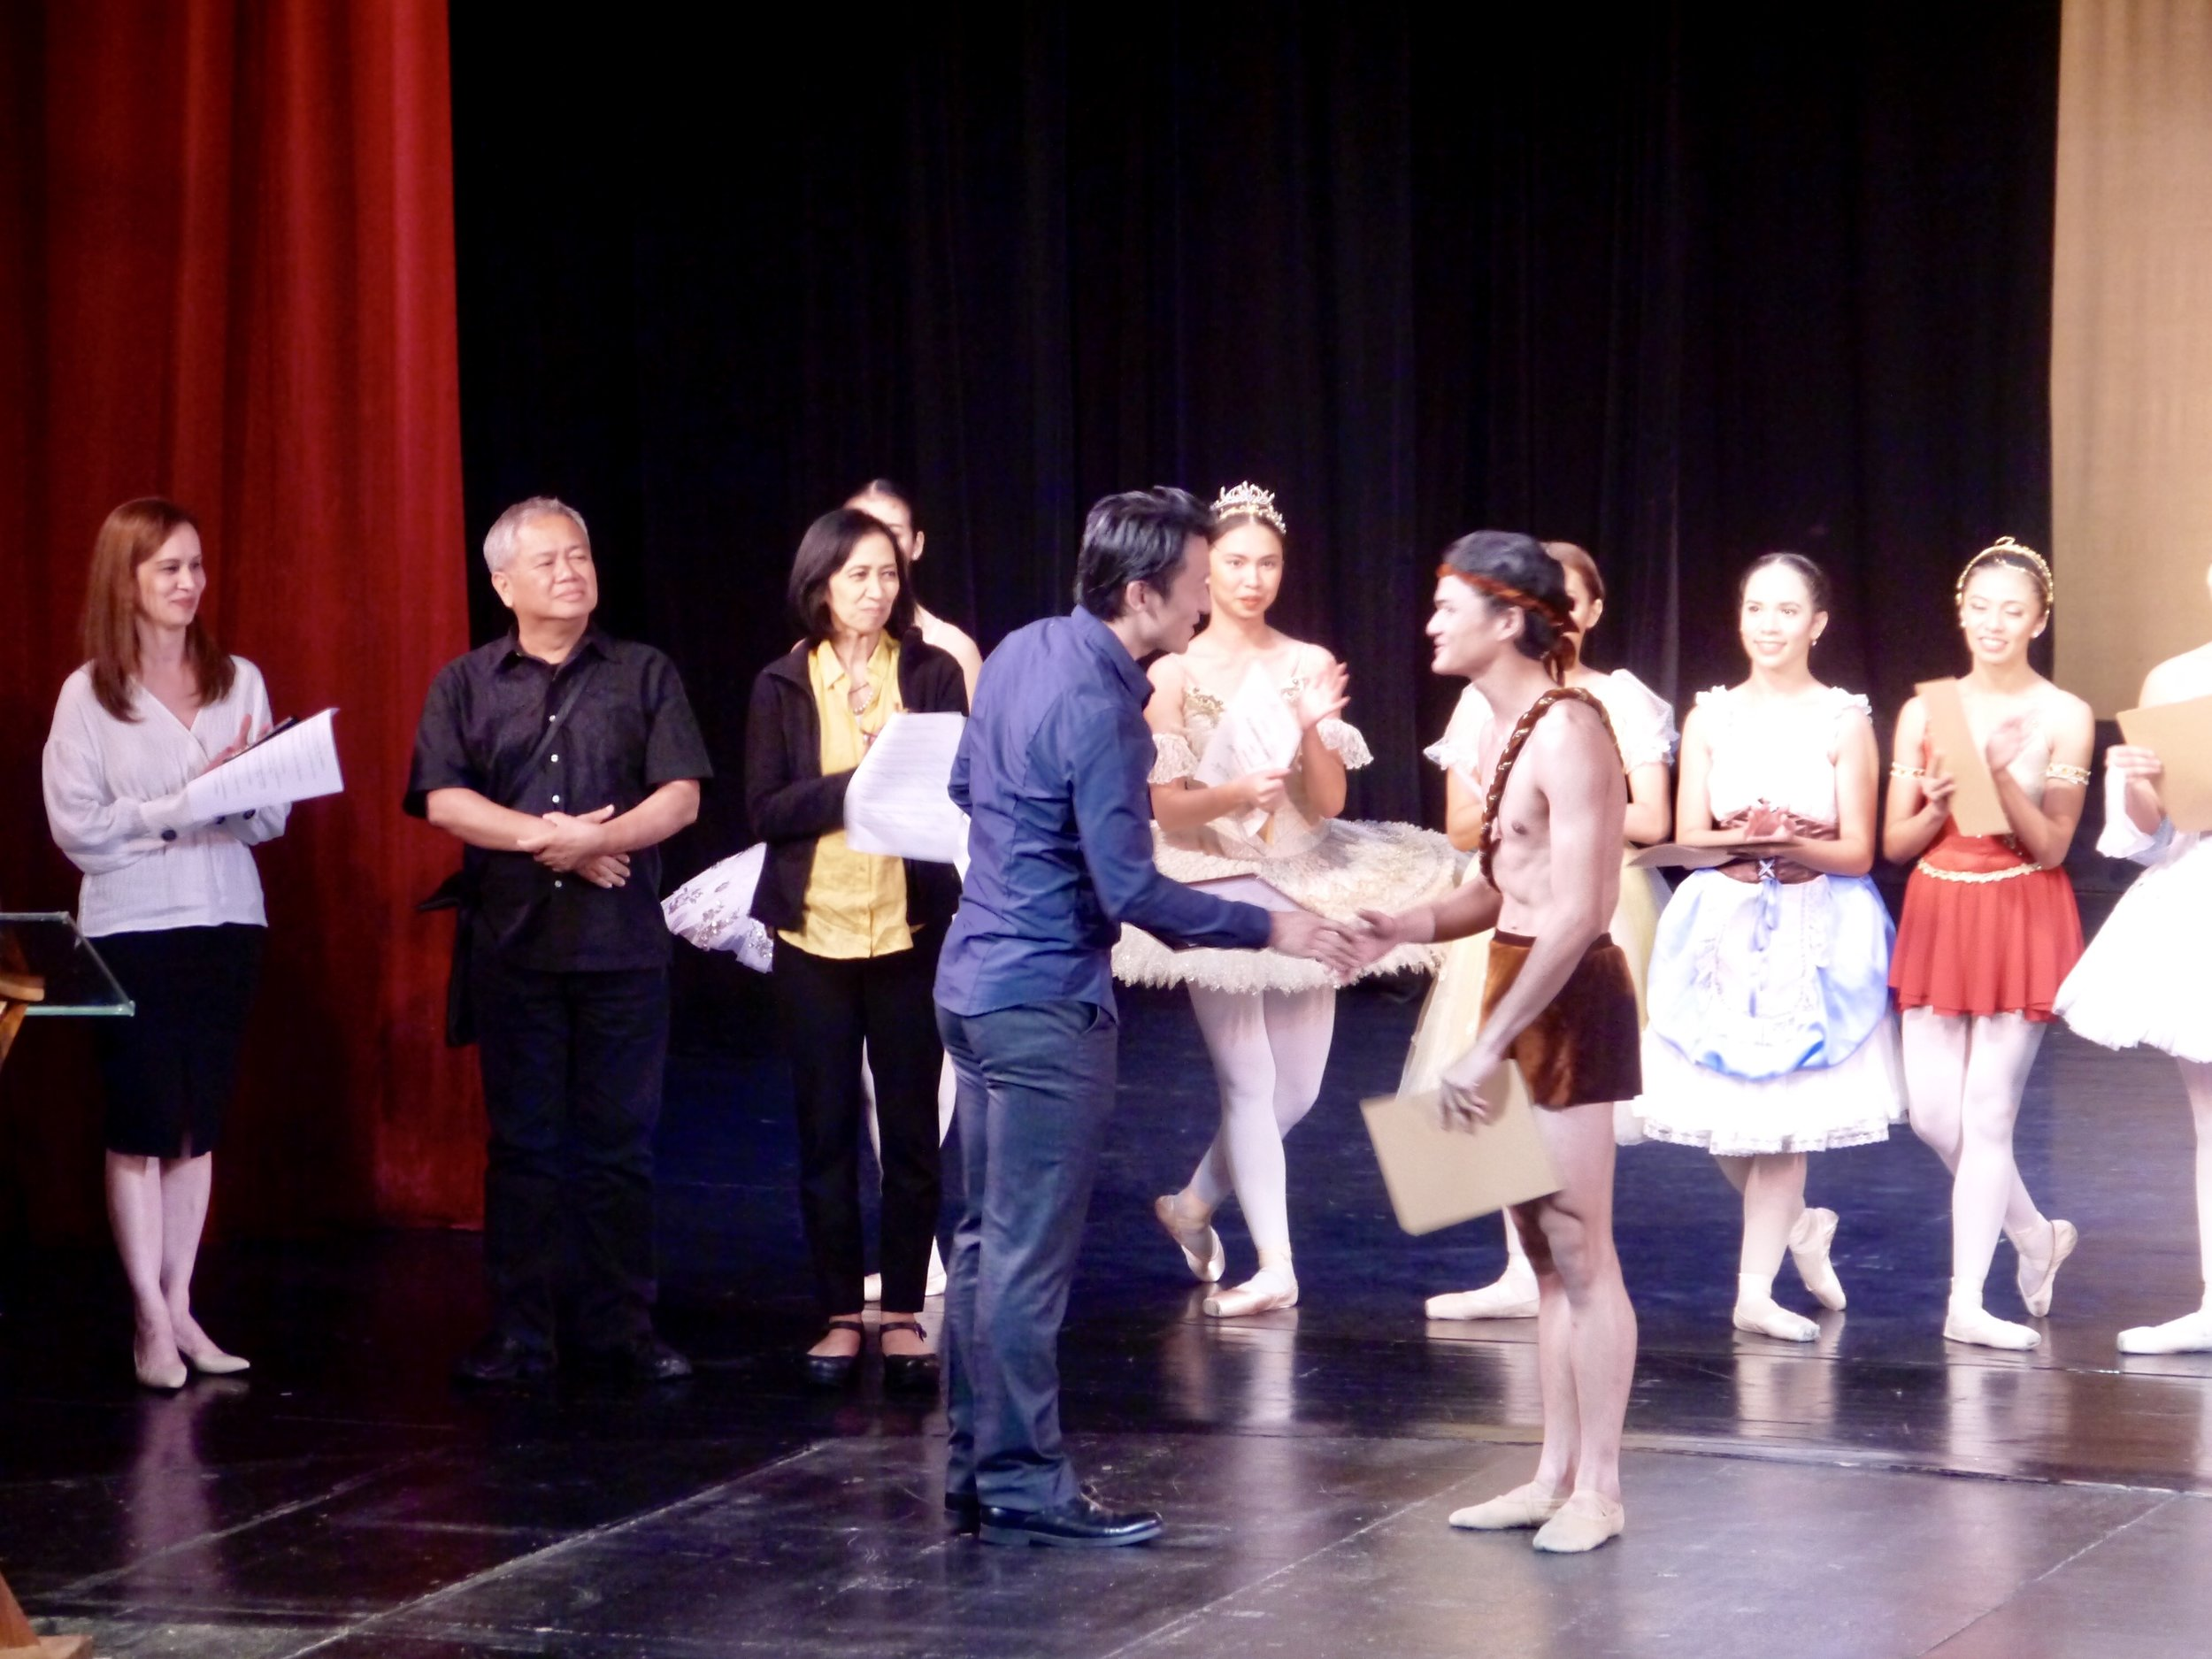 Joshua Enciso receives his award from juror Qi Huan as jurors Melanie Motus, Raul Sauz and Myra Beltran and senior competitors look on.